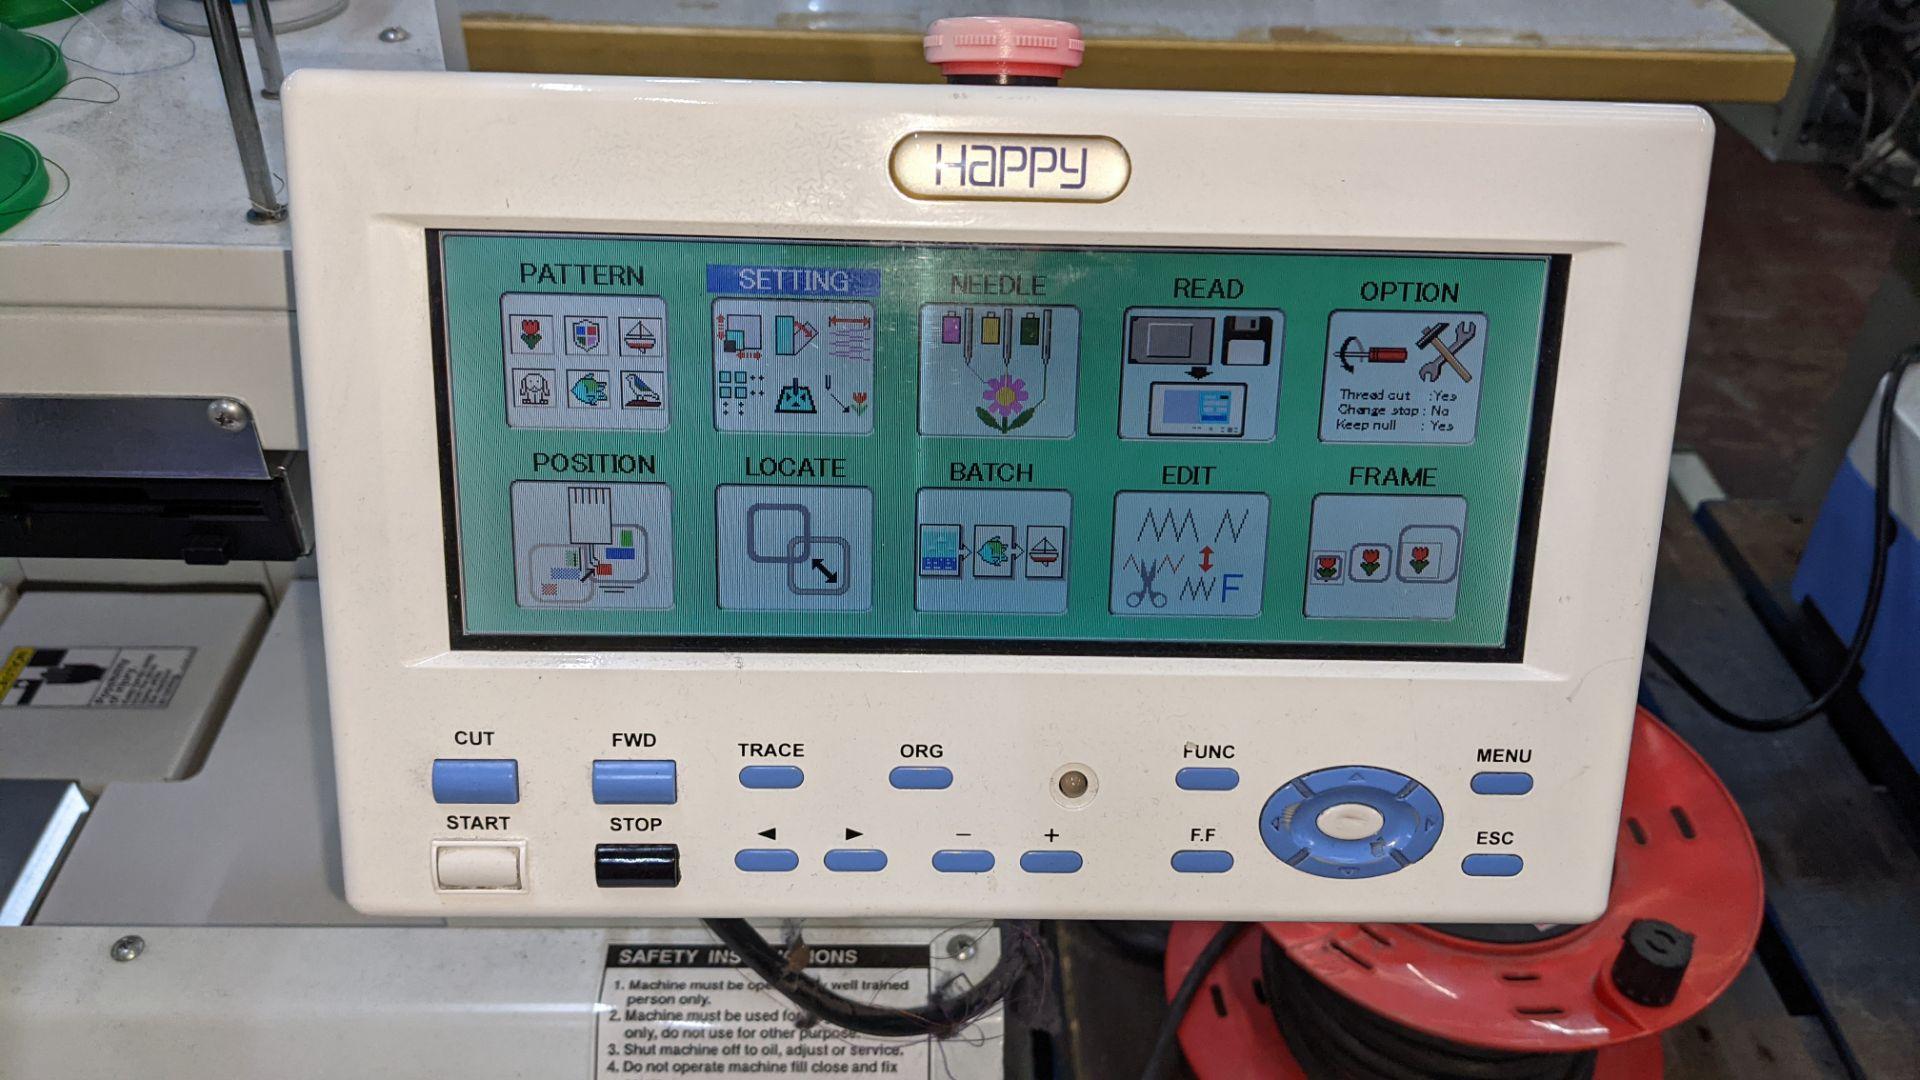 Happy single head embroidery machine model HCD-1501-40 - Image 7 of 22